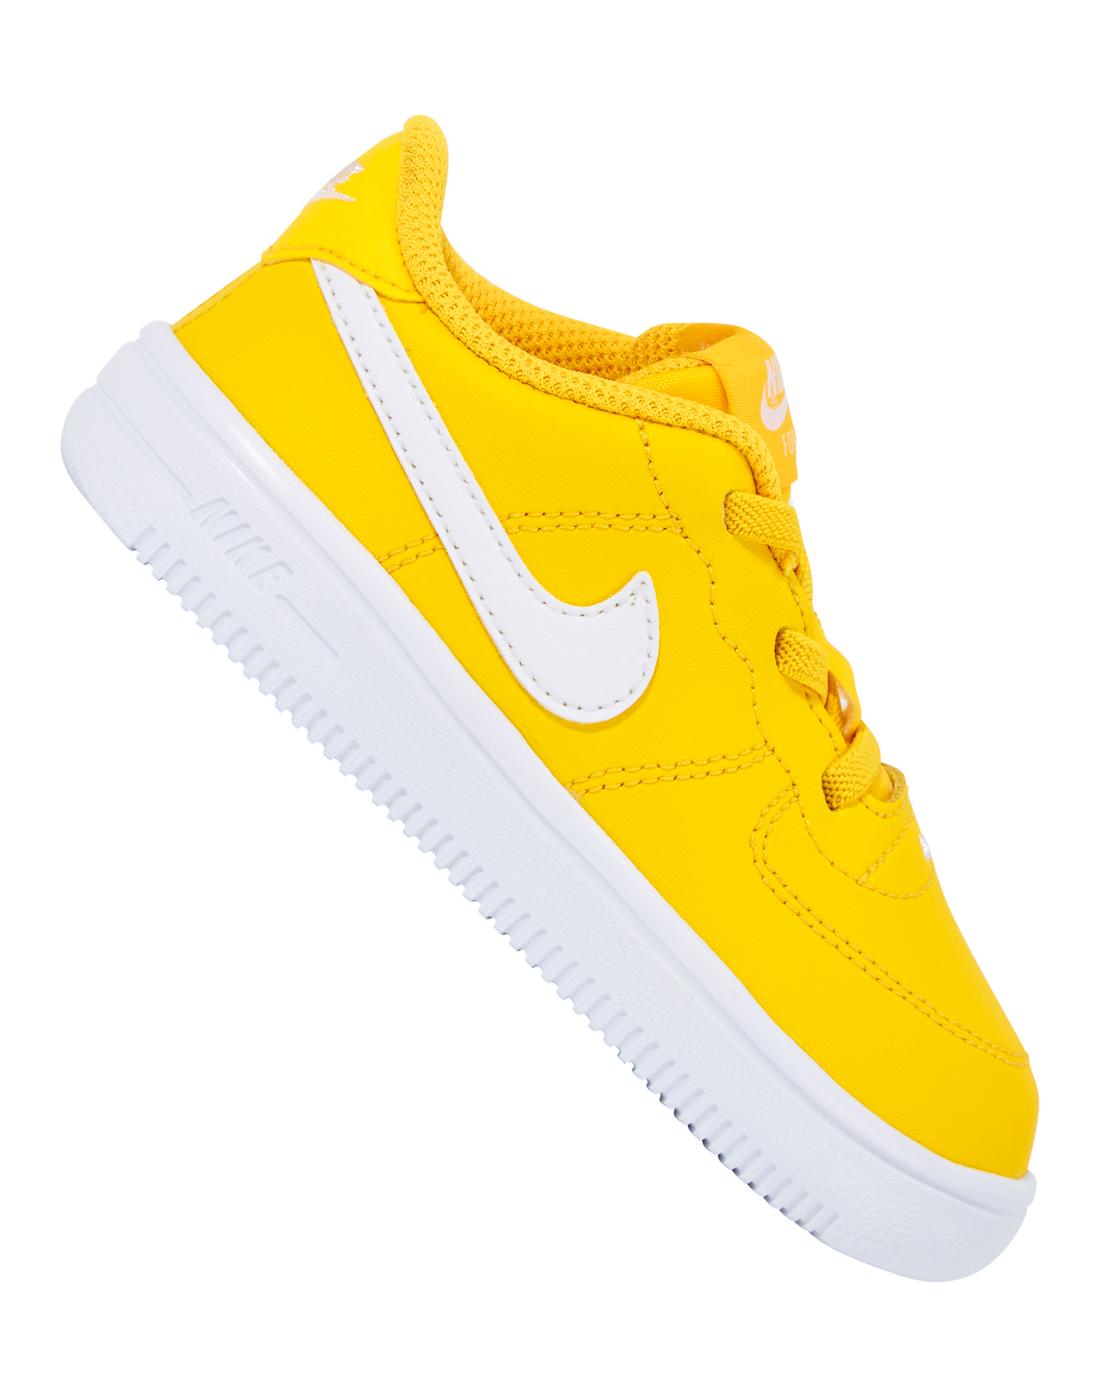 promo code womens nike air max 1 yellow germany 4150b cd175